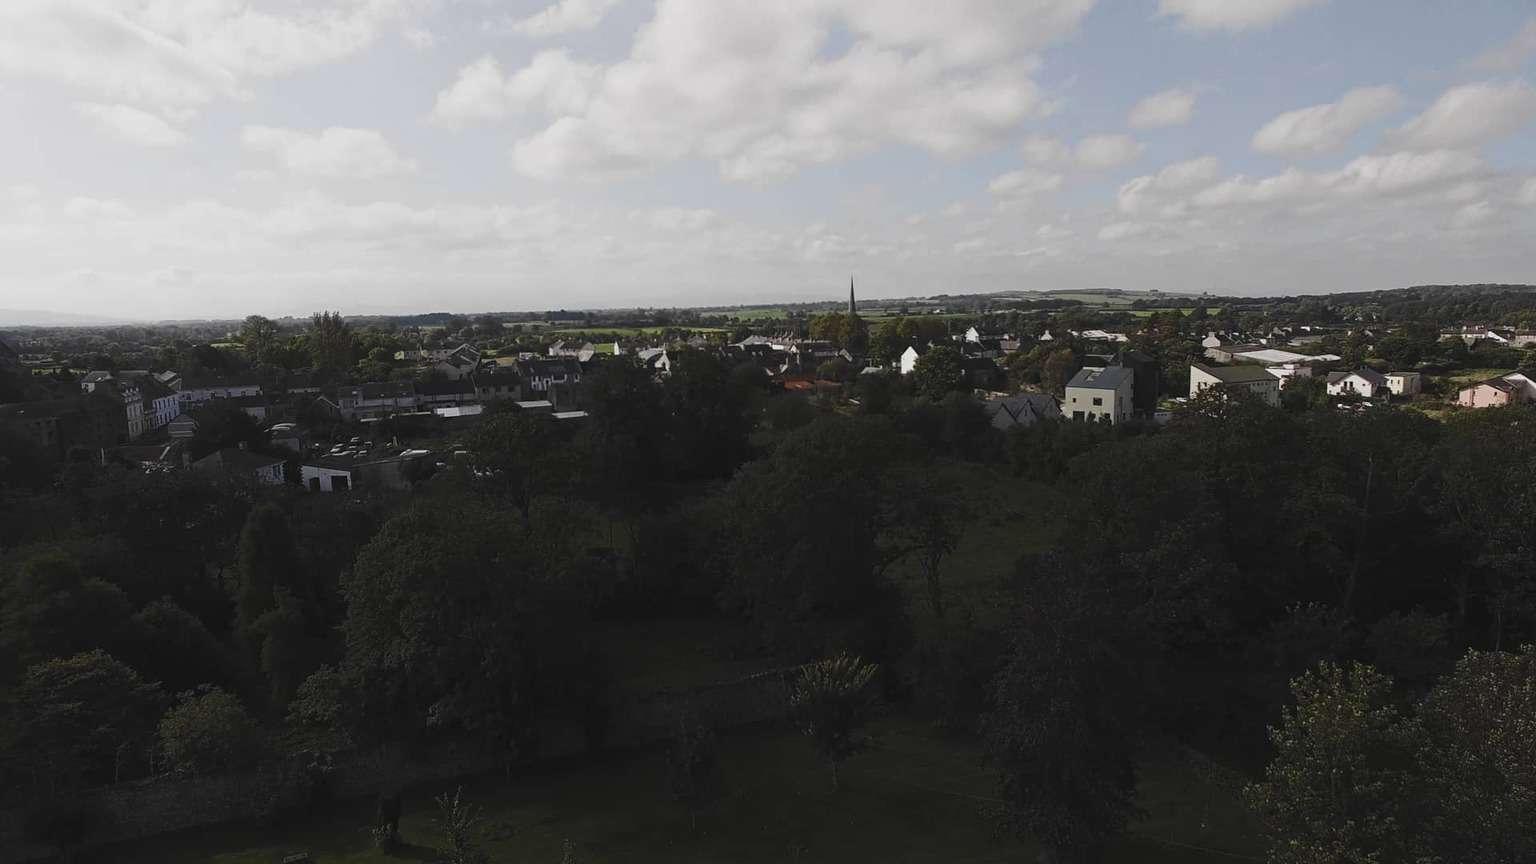 view for Saint Michael's and Saint John's Catholic Church from cloughjordan